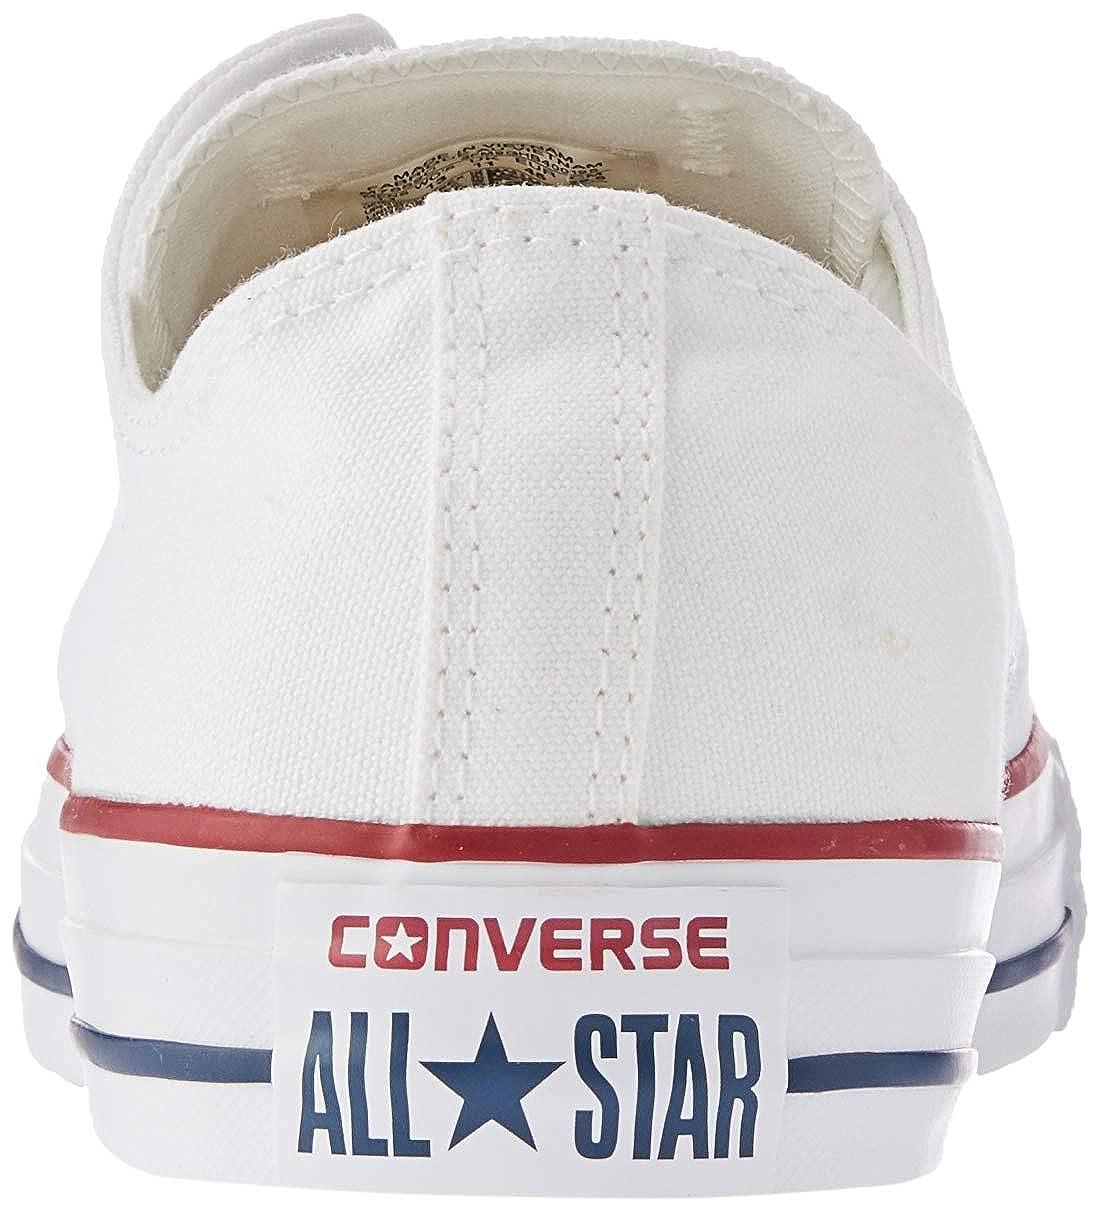 33a96d351 Converse Converse Chuck Taylor All Star Ox